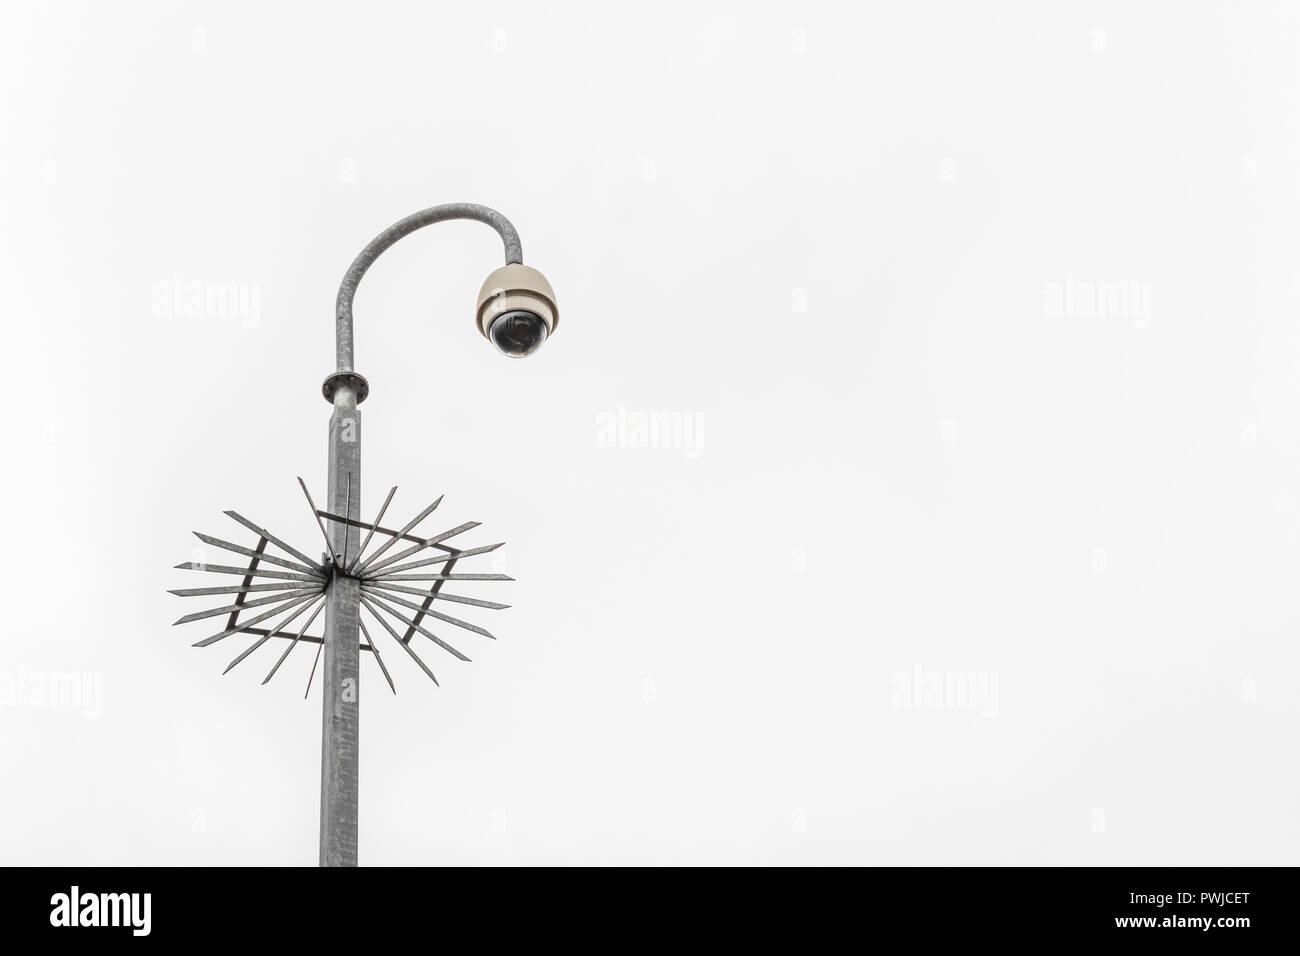 CCTV surveillance camera & bleak grey sky. Surveillance State & crime prevention metaphor, security system, privacy campaigners, face recognition. Stock Photo